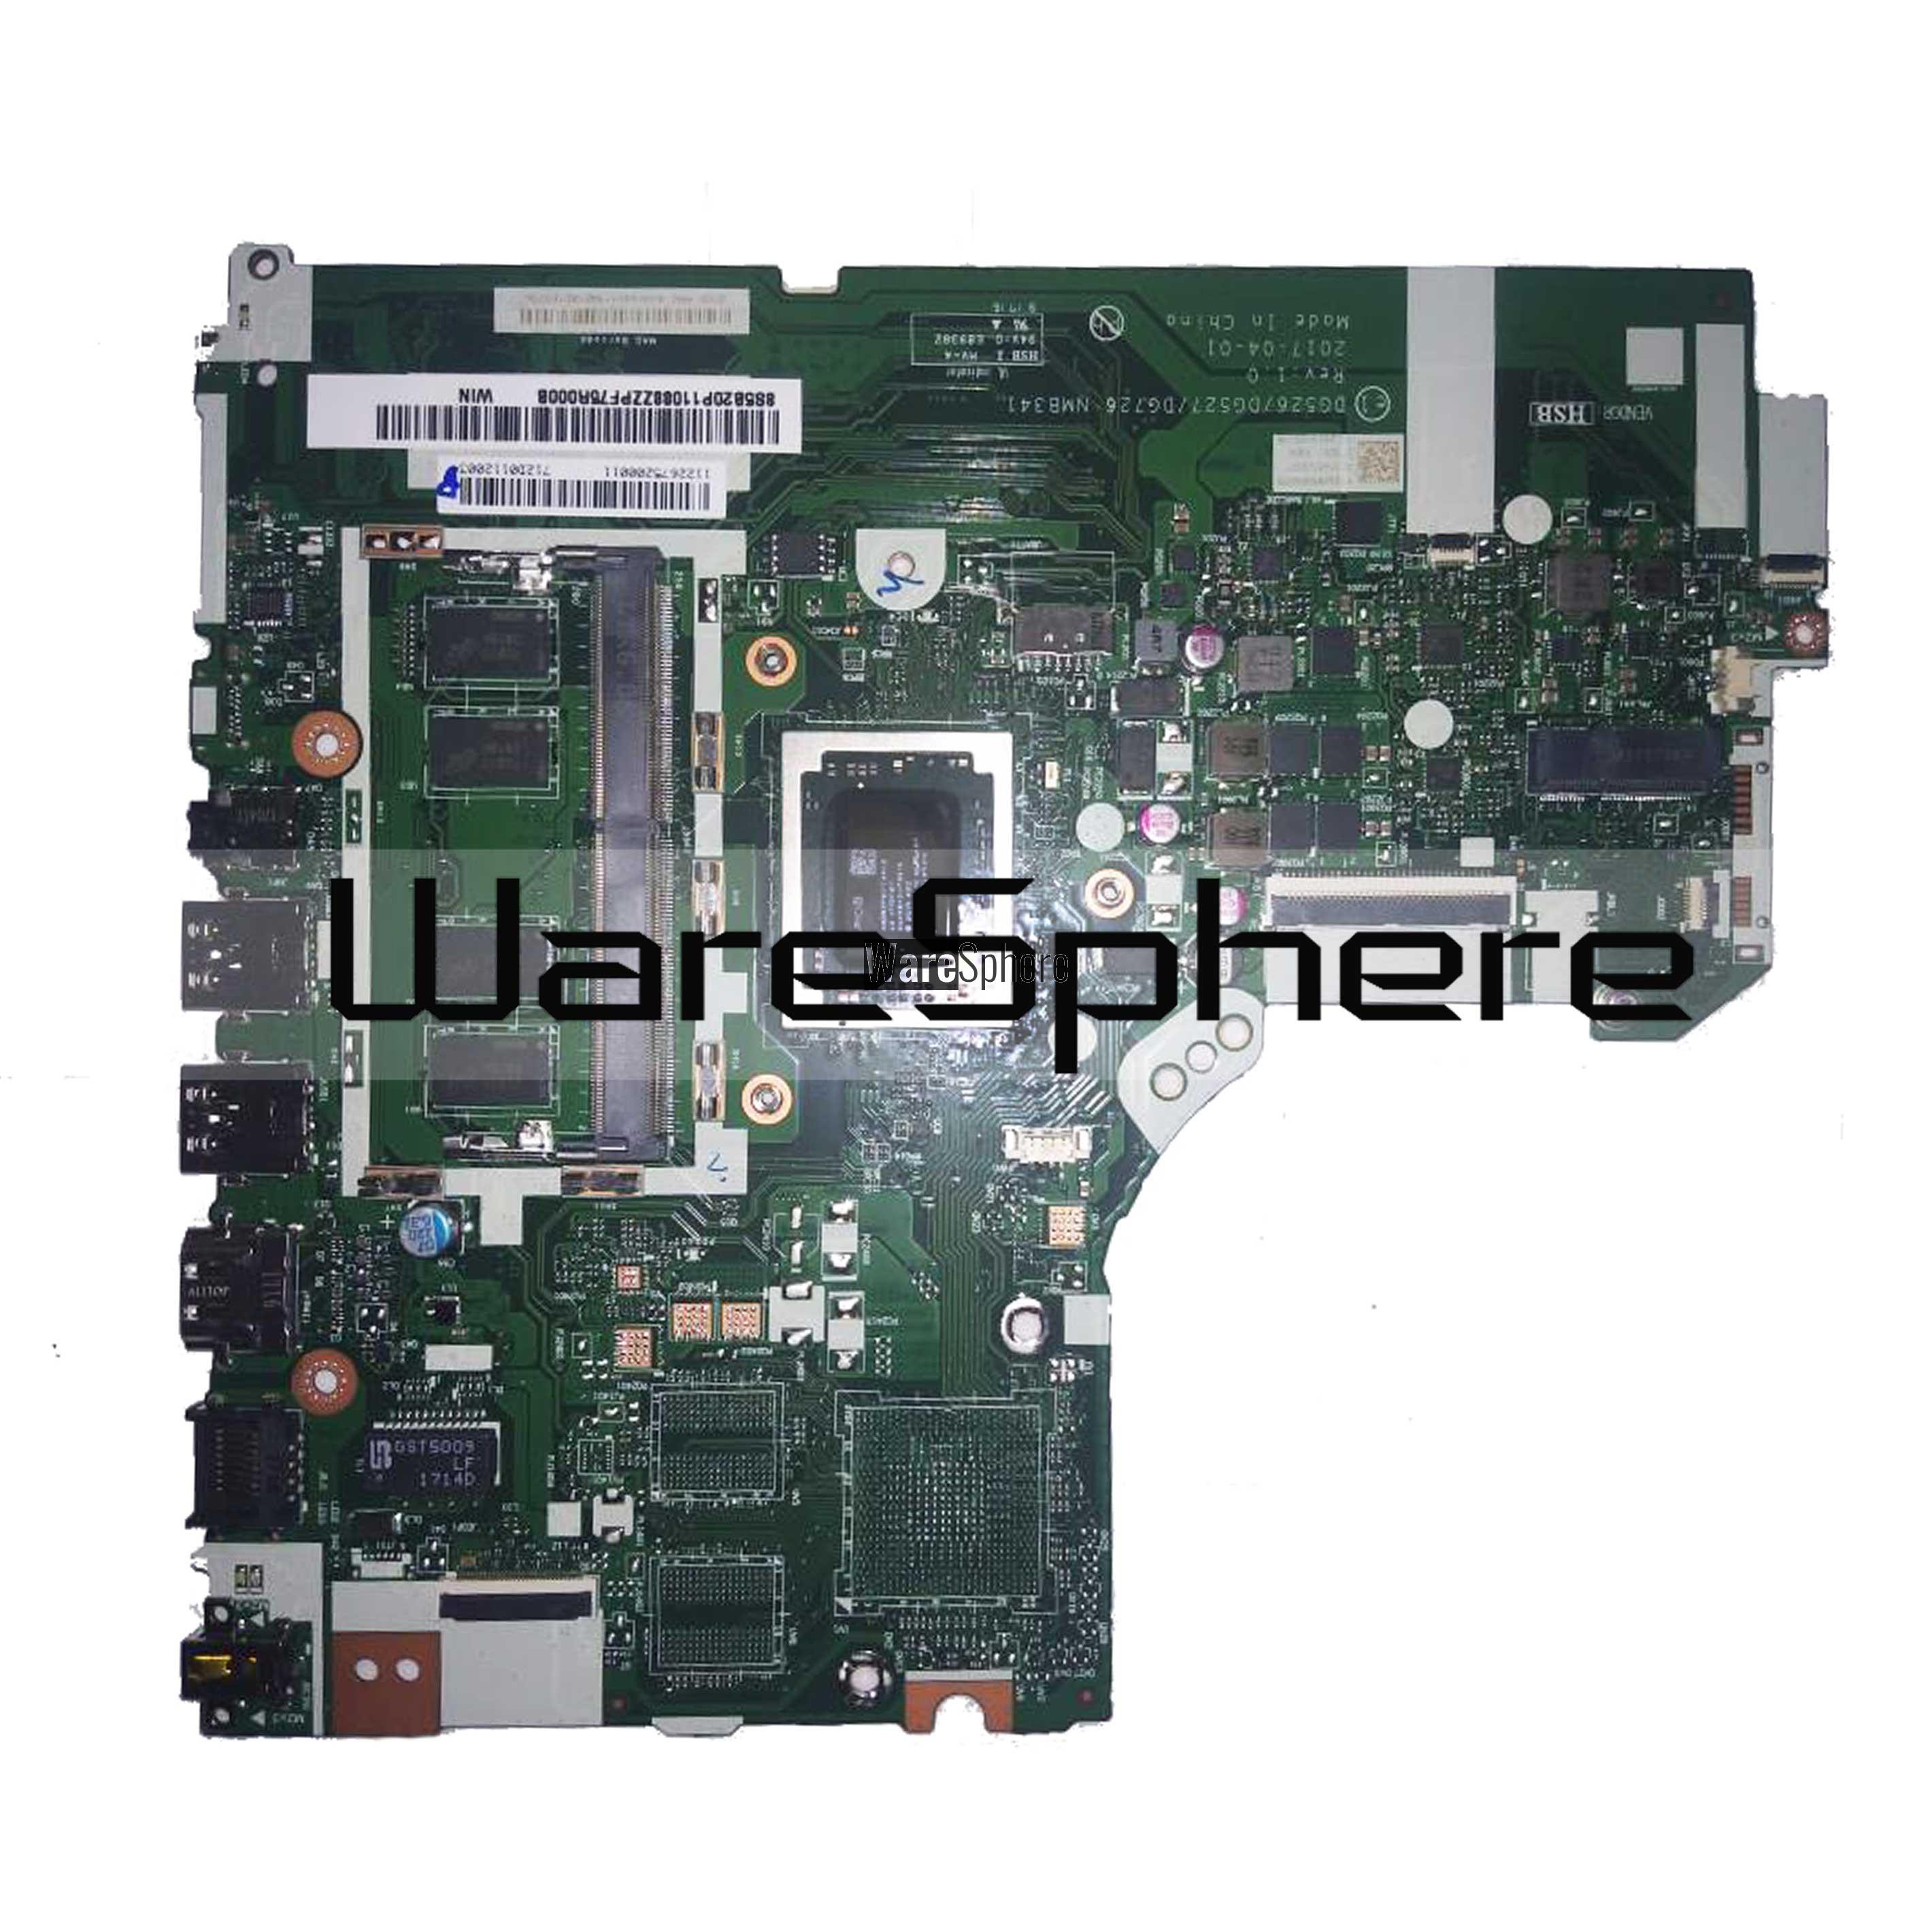 5b20p11088 Nm B341 Motherboard Amd A10 9620p Uma 4gb For Lenovo Ideapad 320 15abr